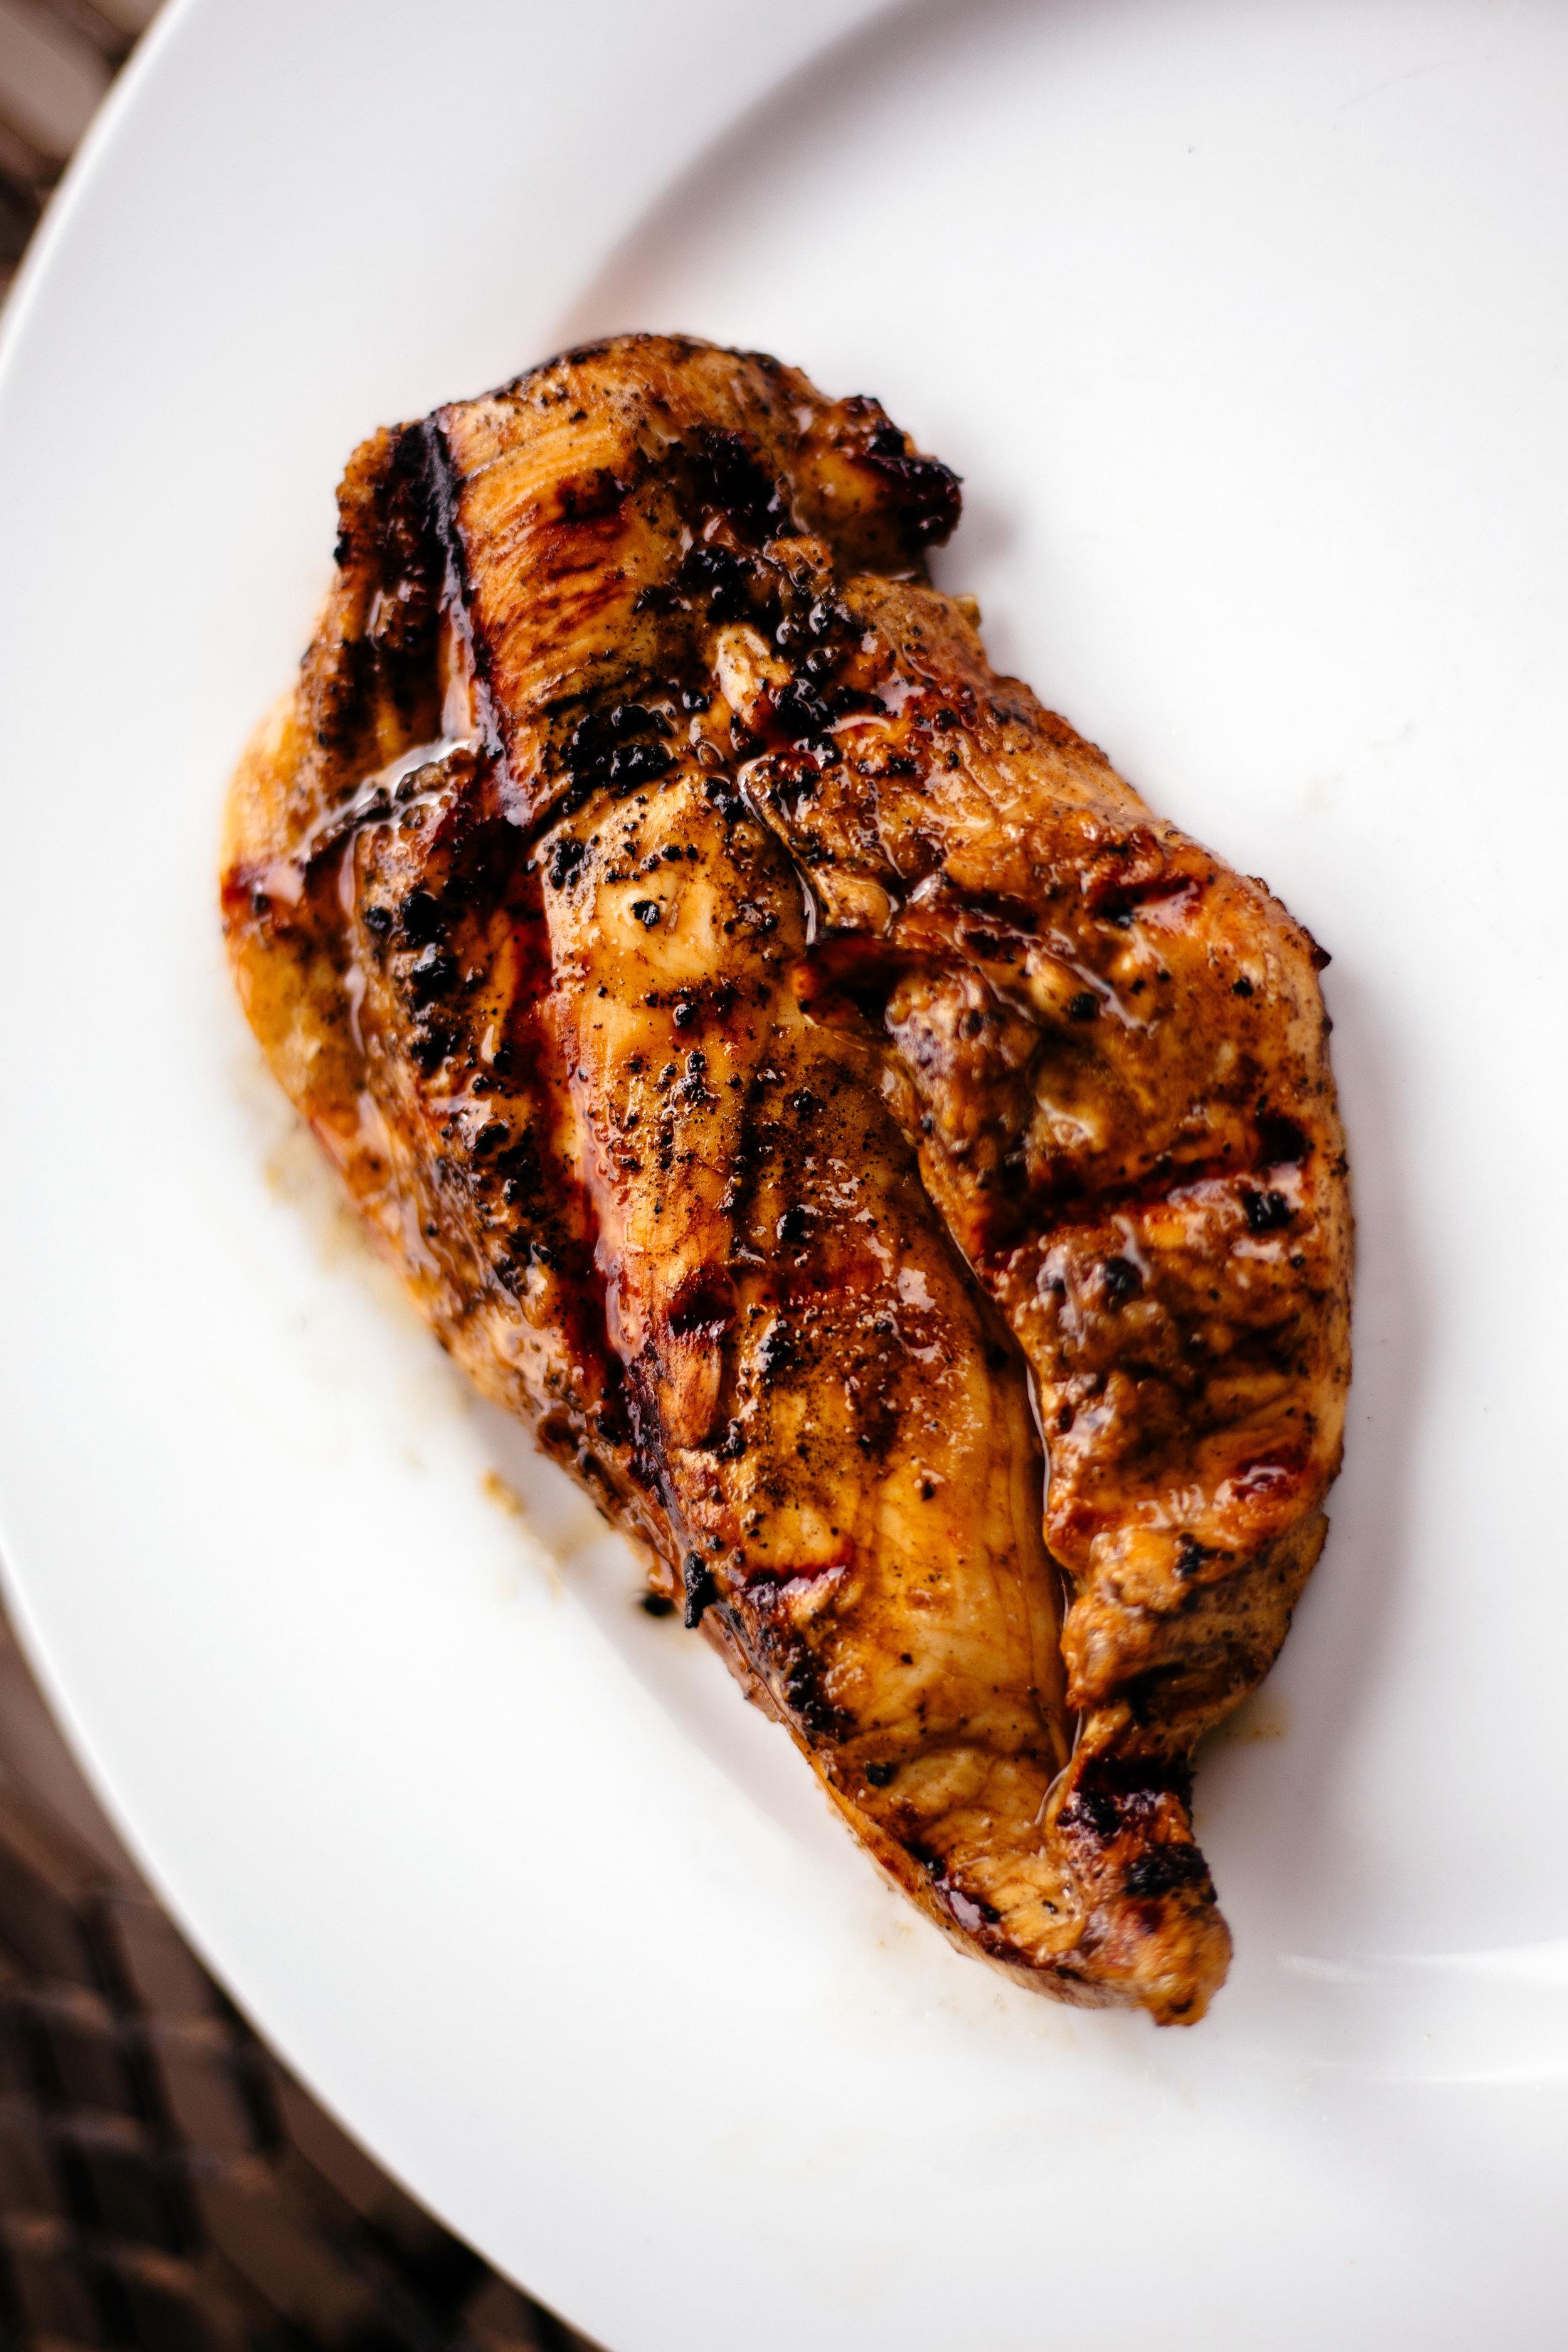 BBQ Chicken 2 edit.jpg